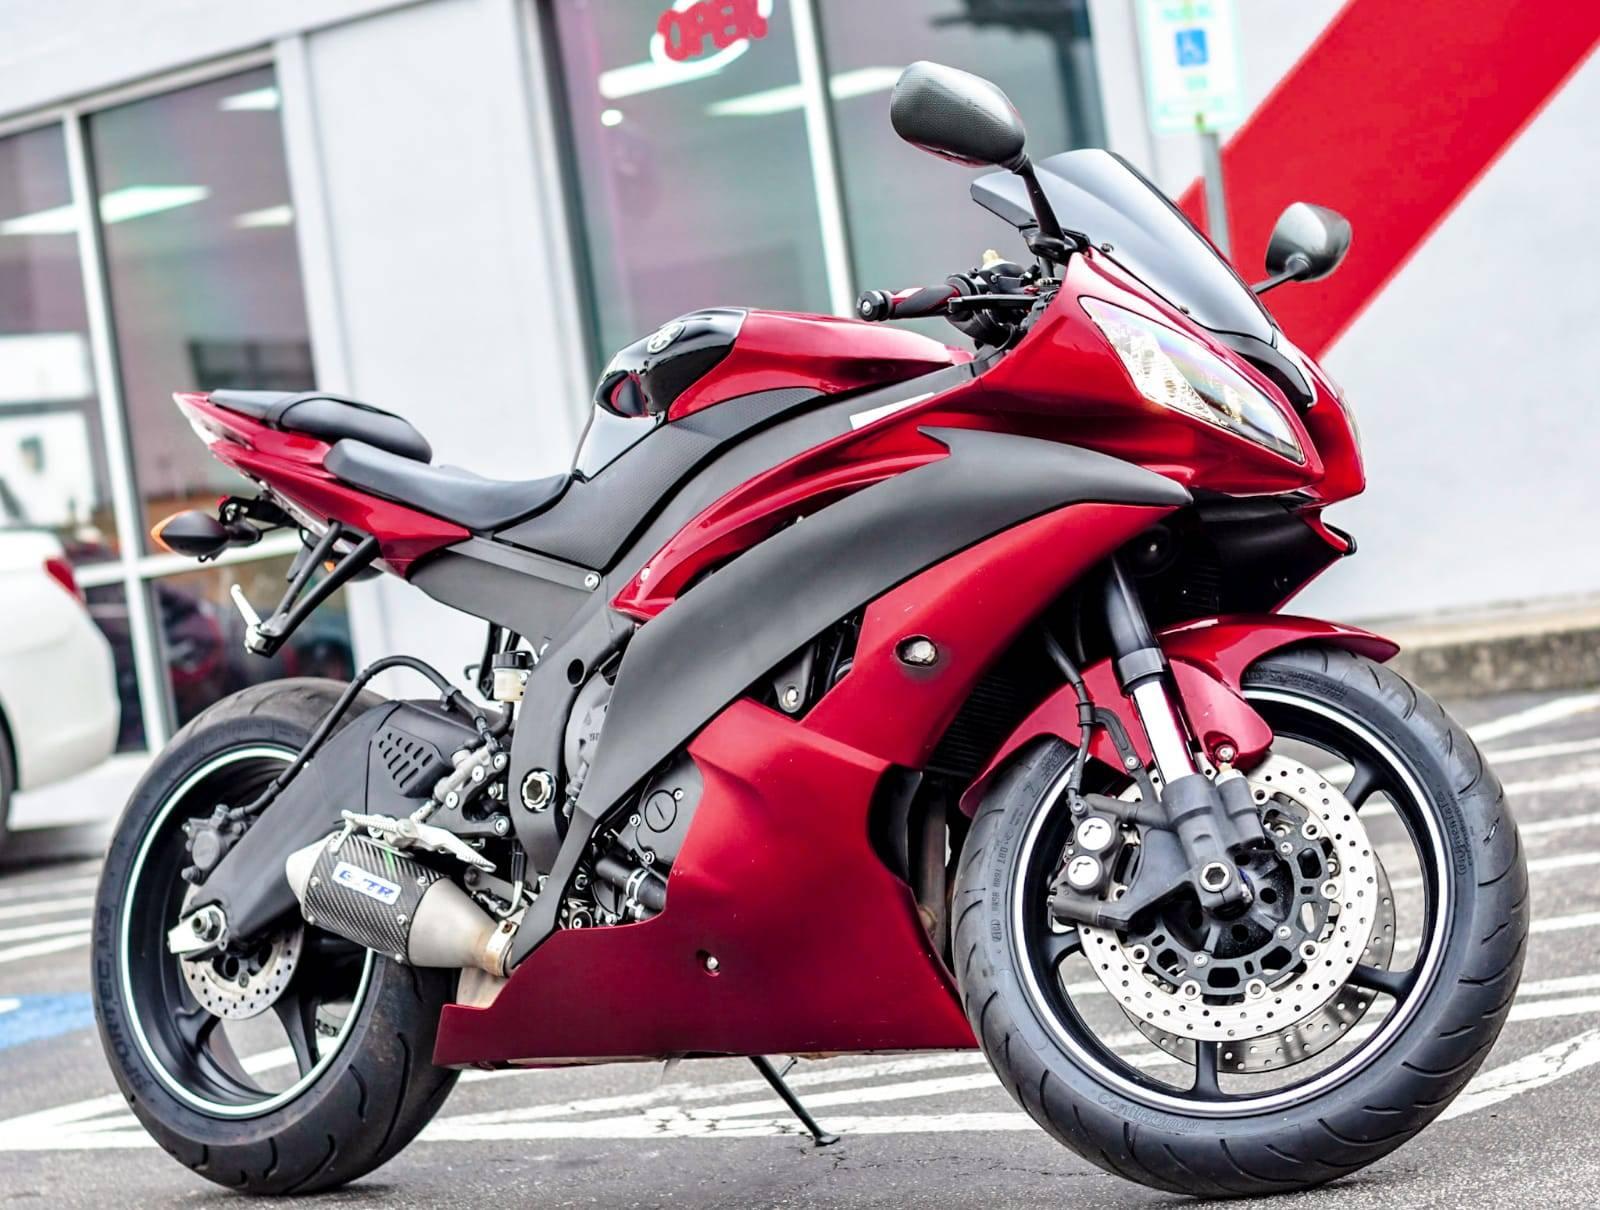 2015 Yamaha YZF-R6 for sale 235966